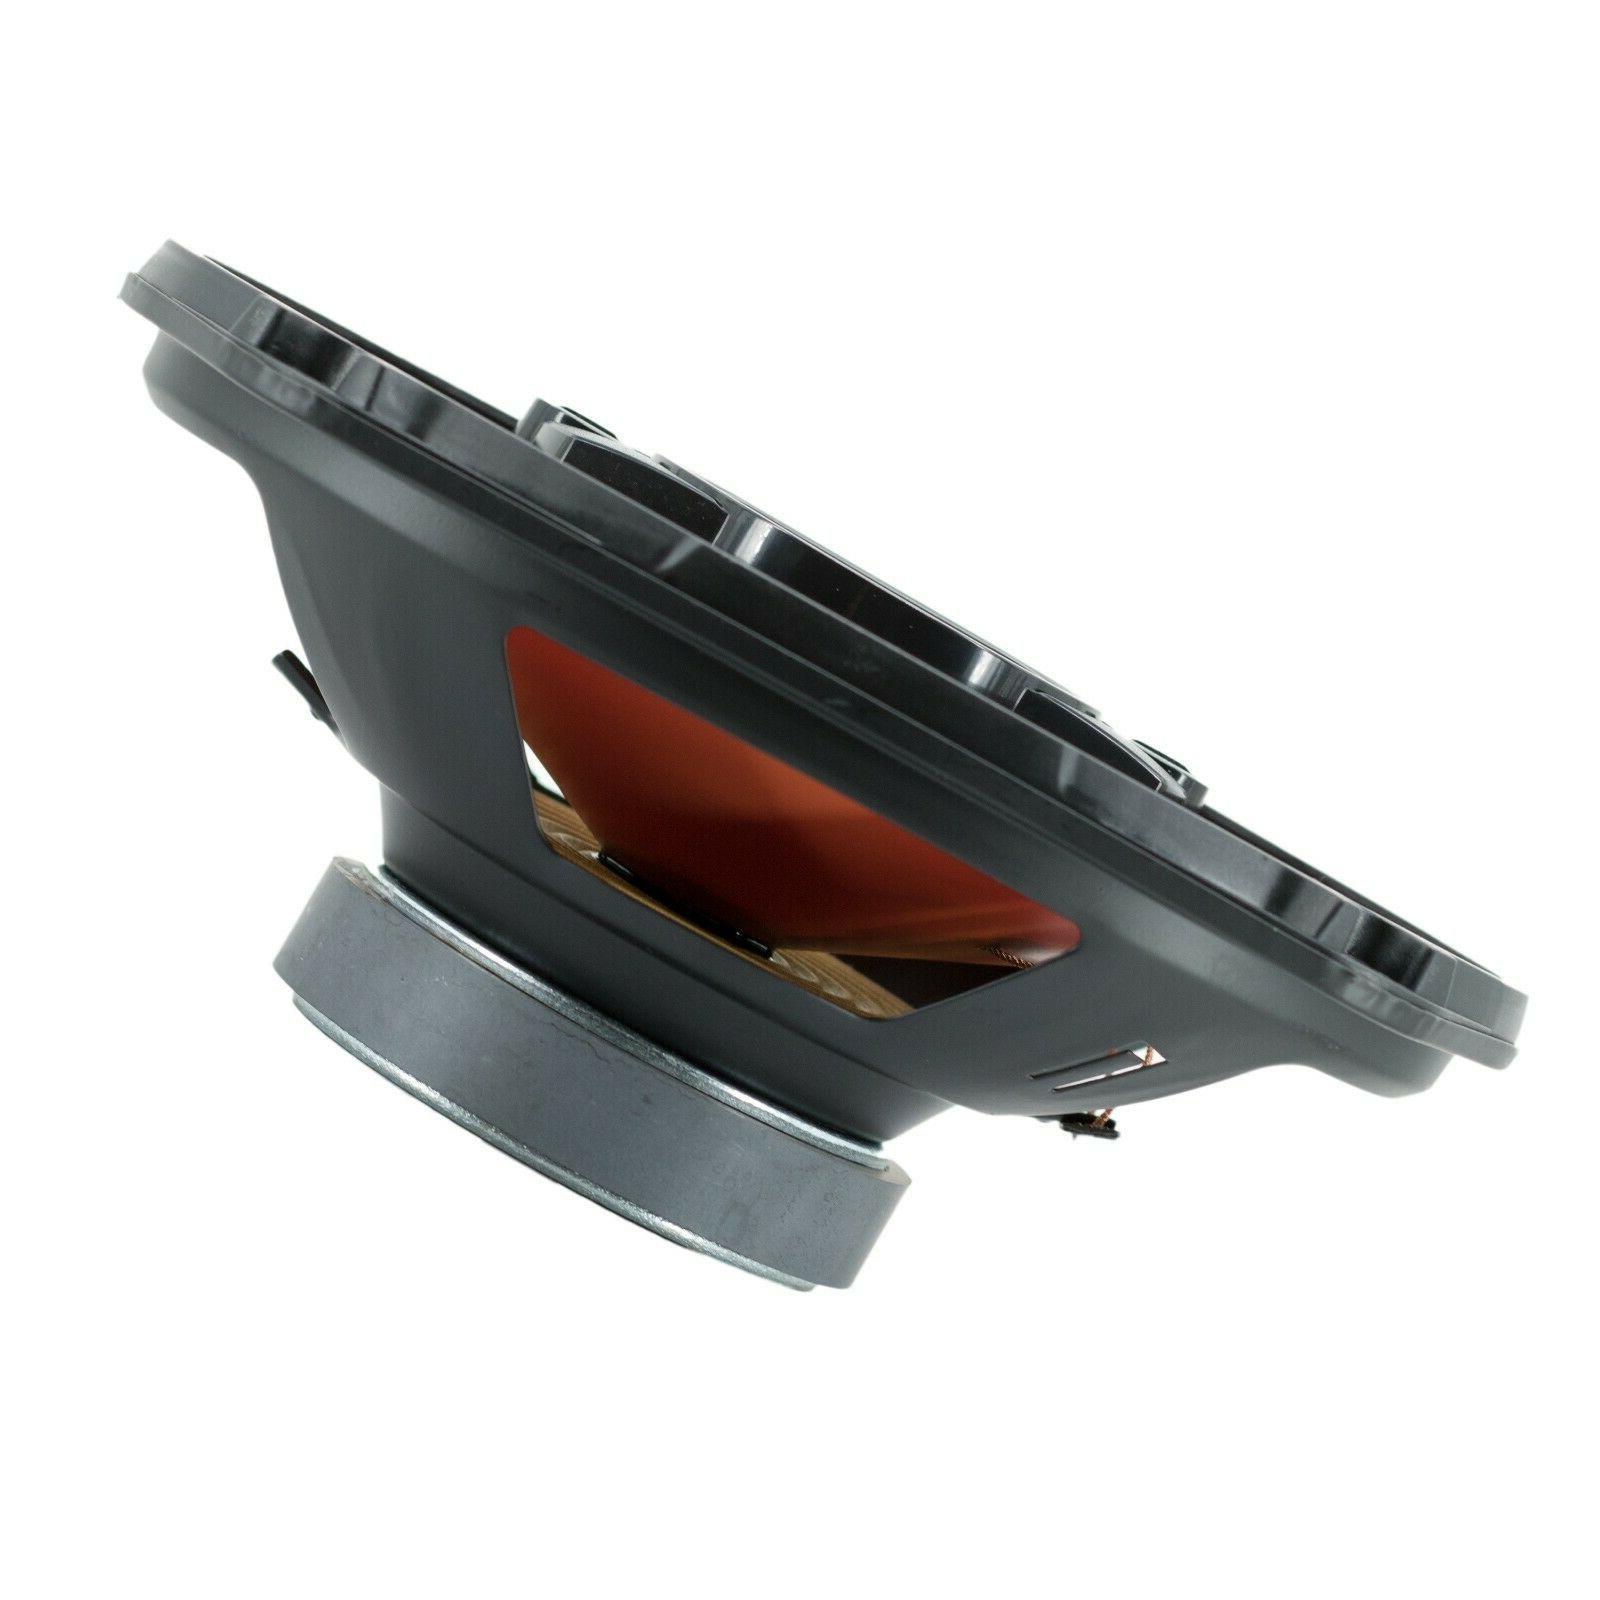 2) Audiobank Watt Stereo Coaxial AB790